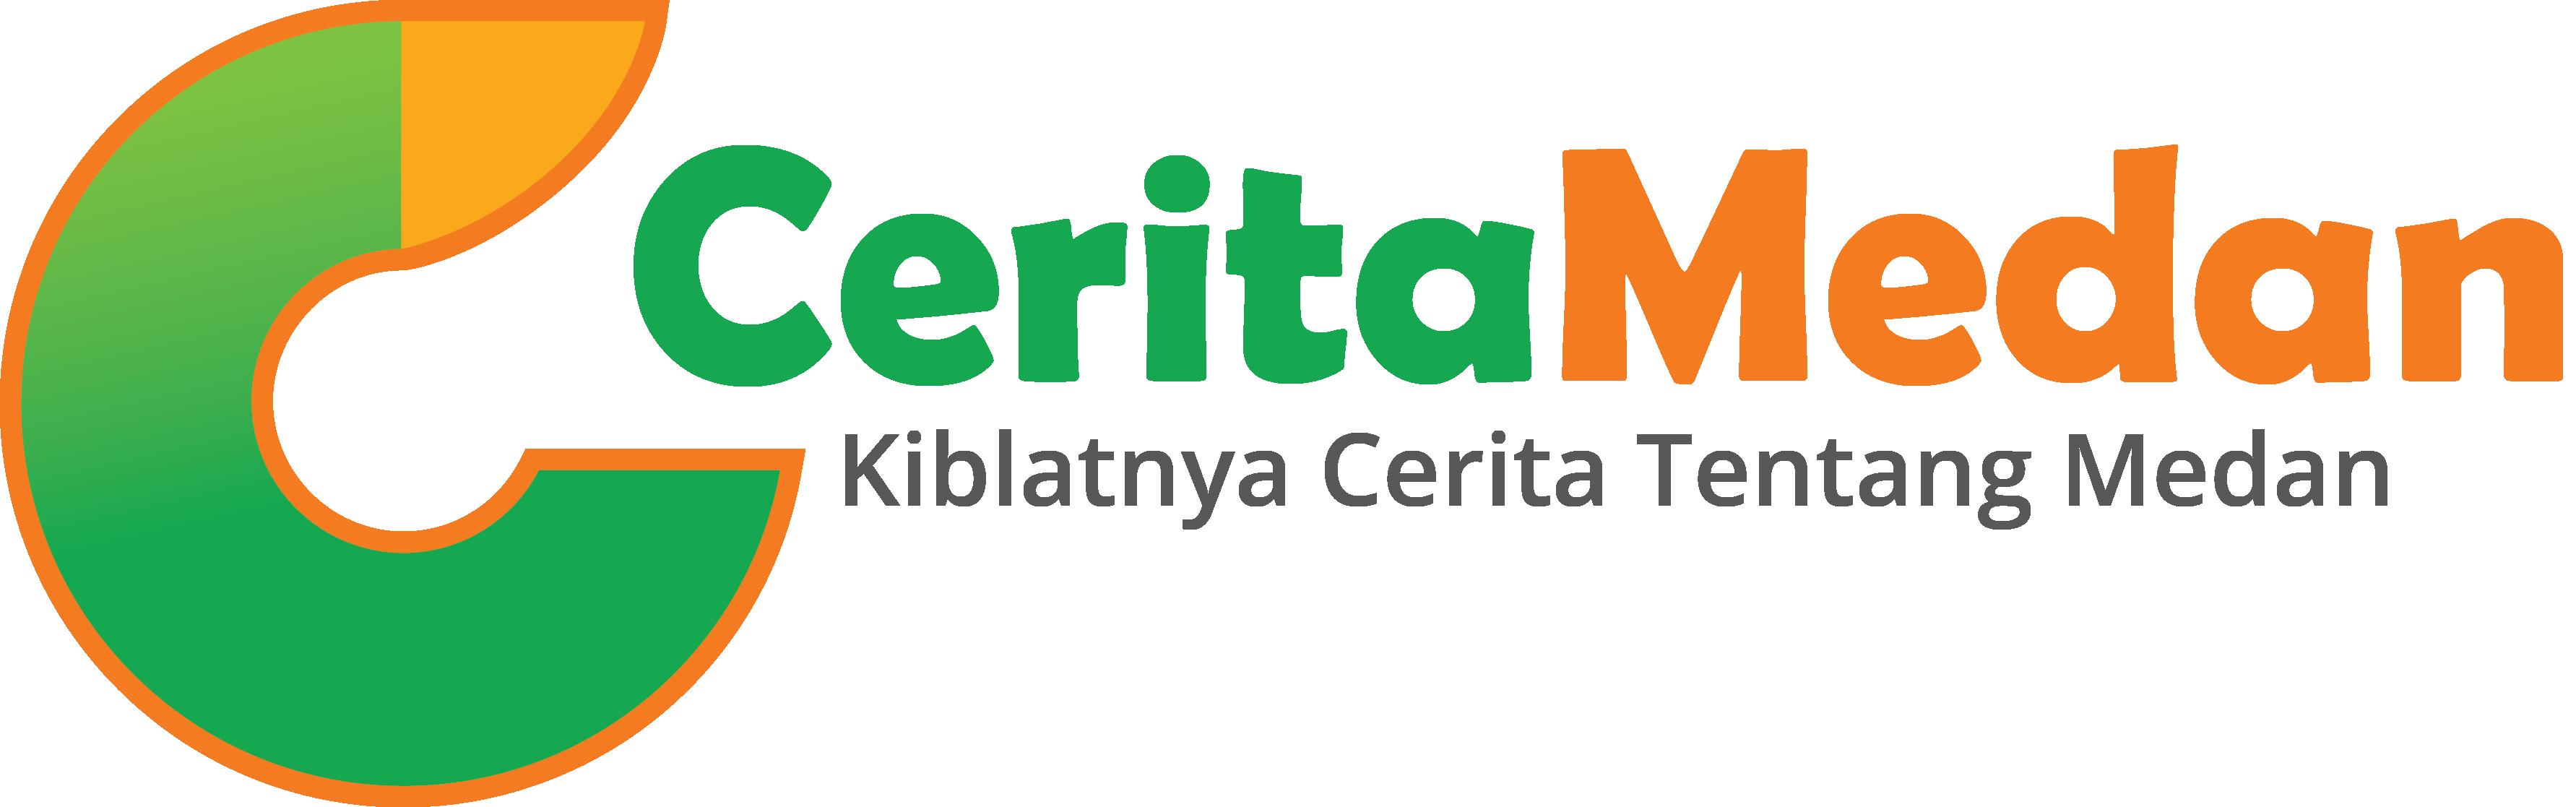 Cerita Medan Logo - PNG